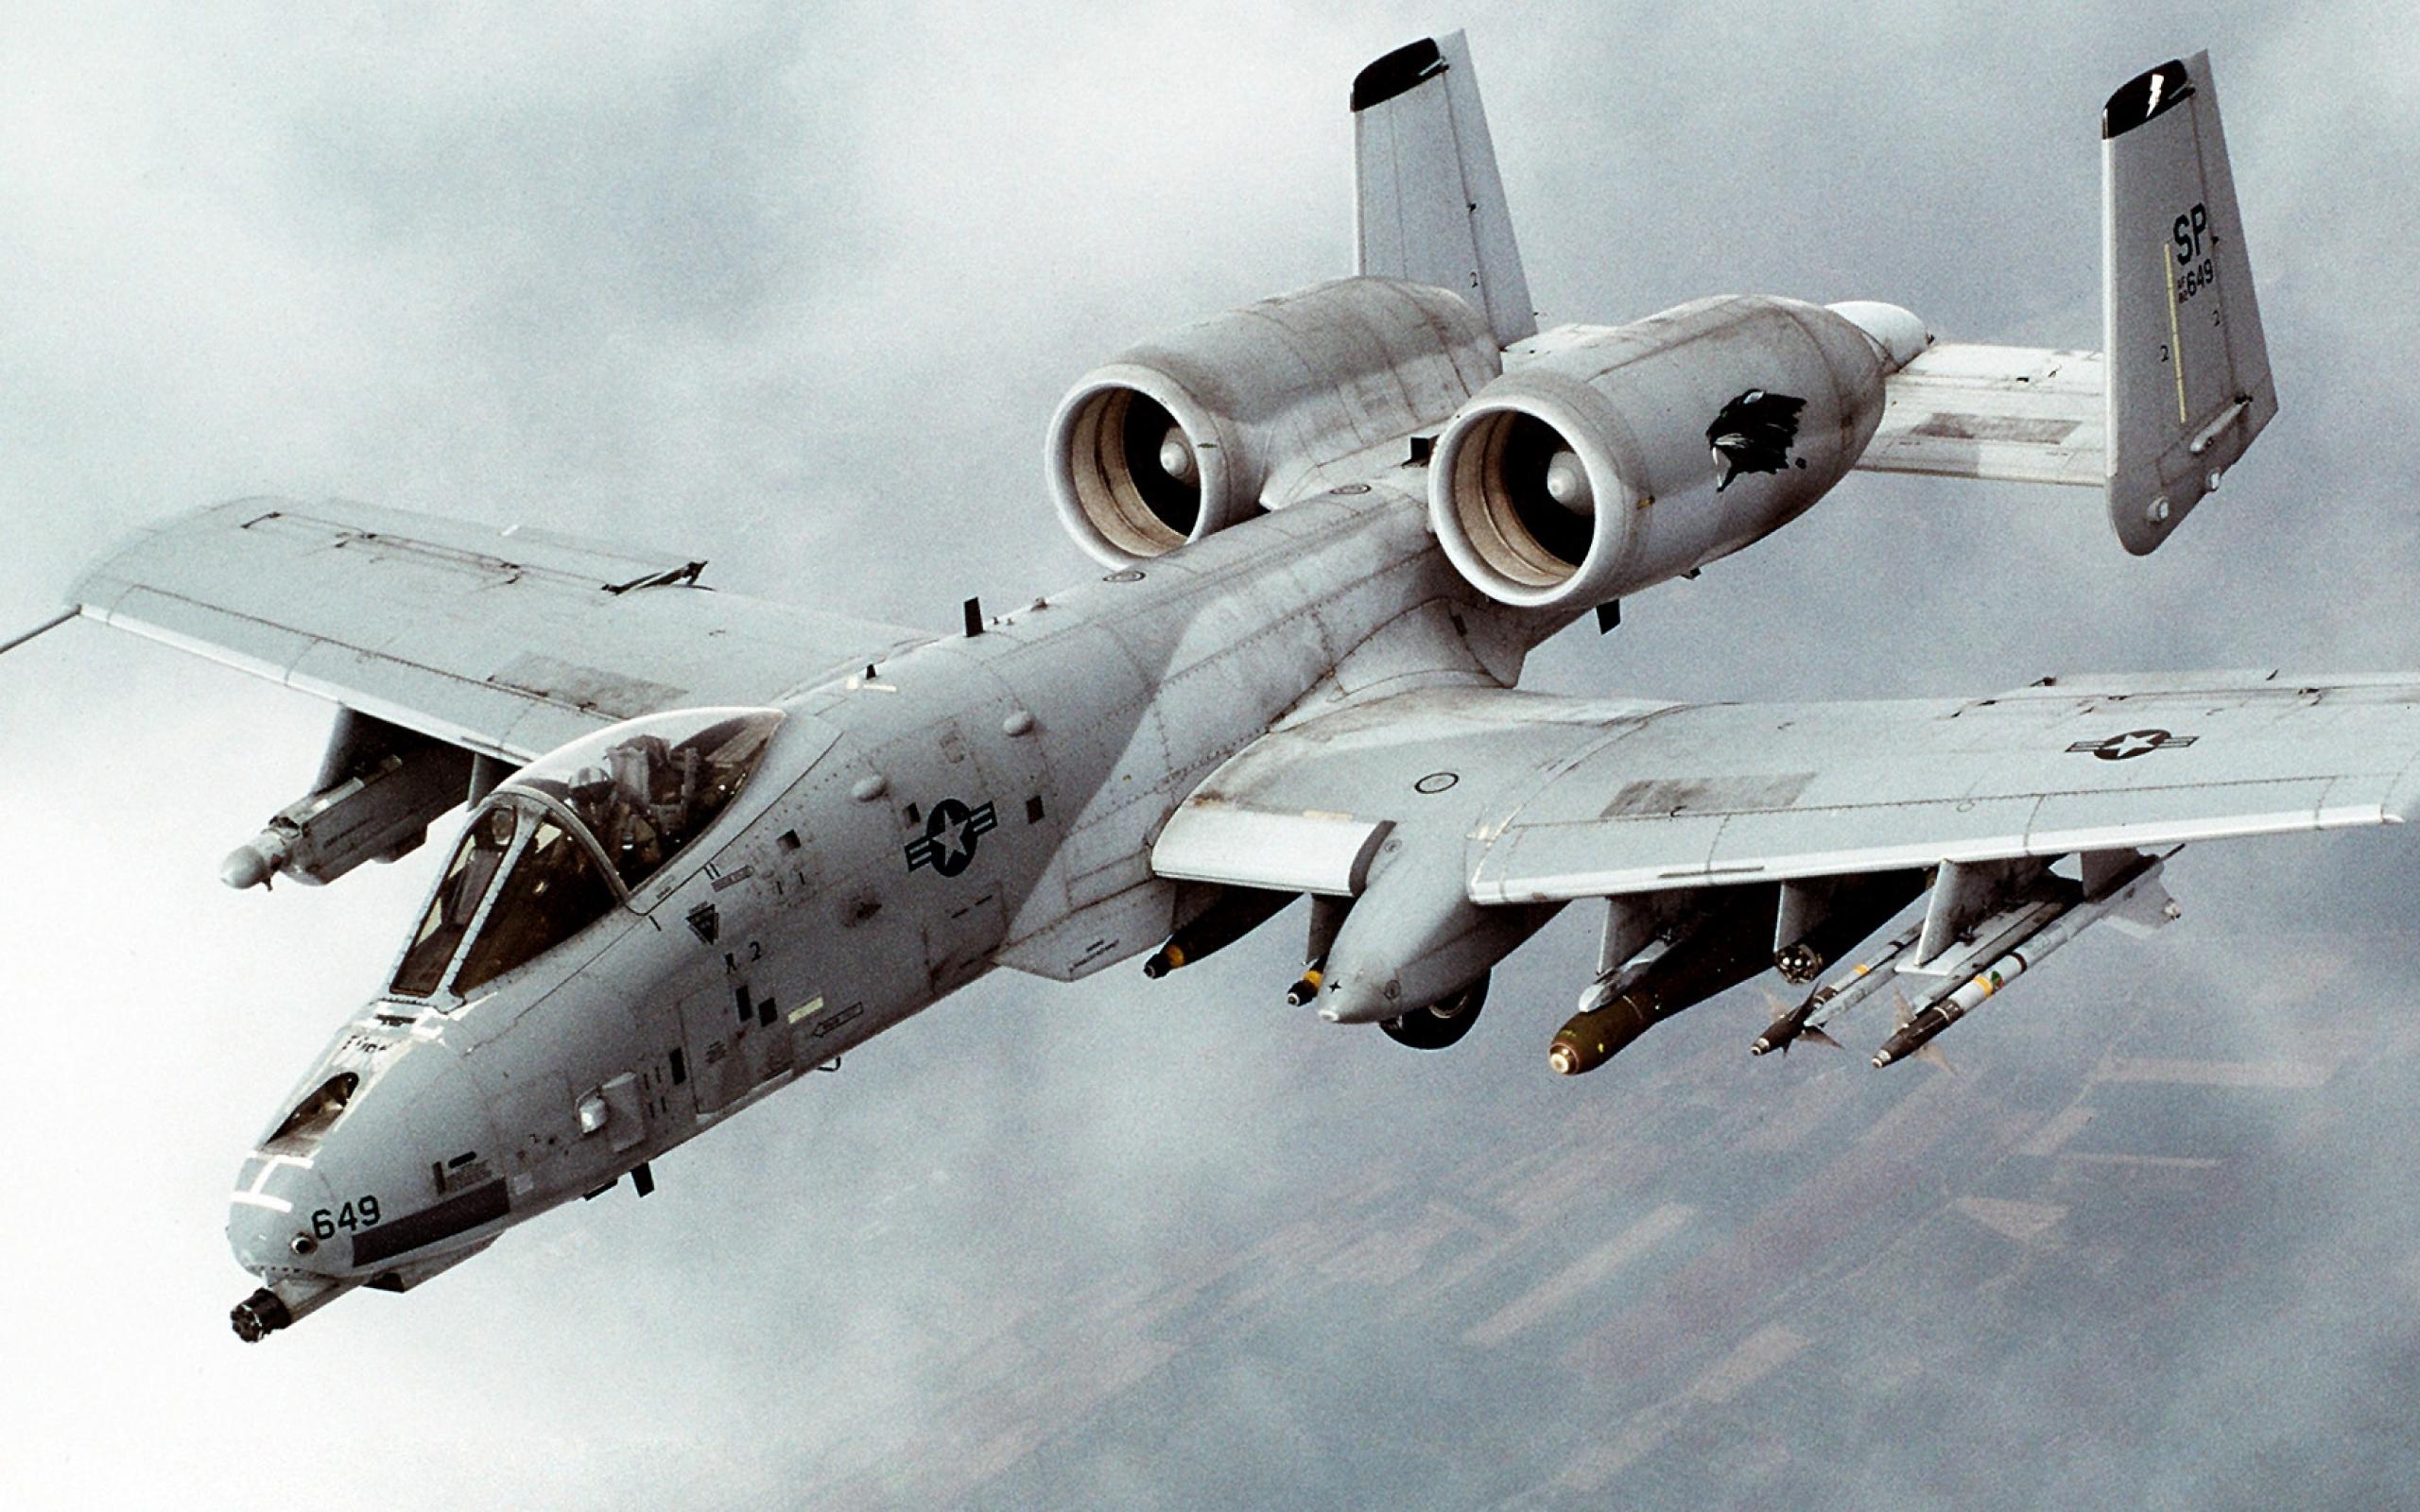 warthog a10 thunderbolt ii Wallpaper Wallpapers Download 2560x1600